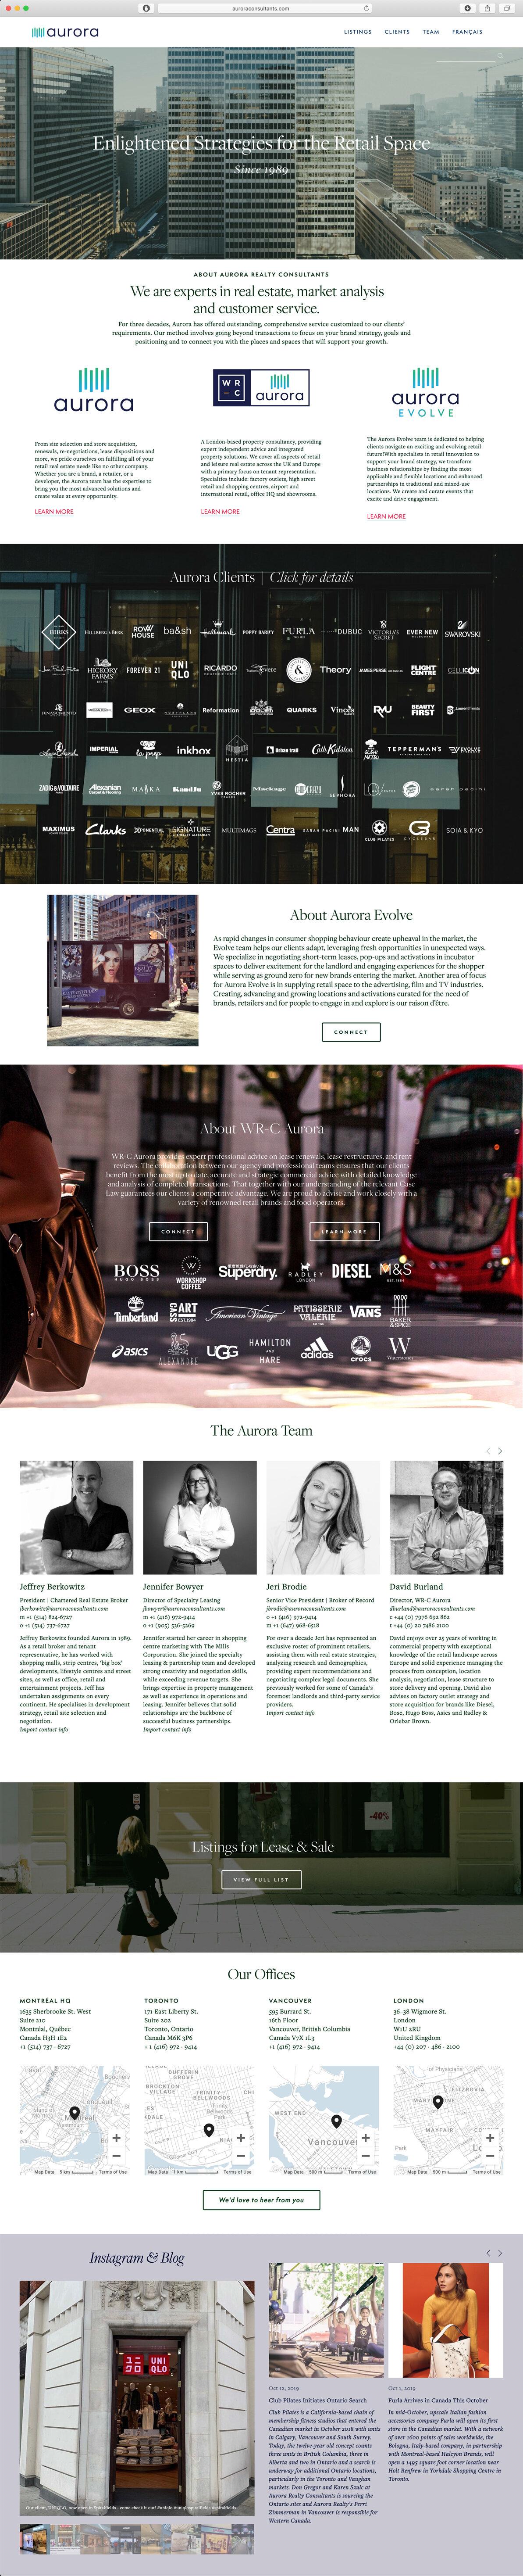 Aurora Realty Consultants - bilingual website design & build, copywriting